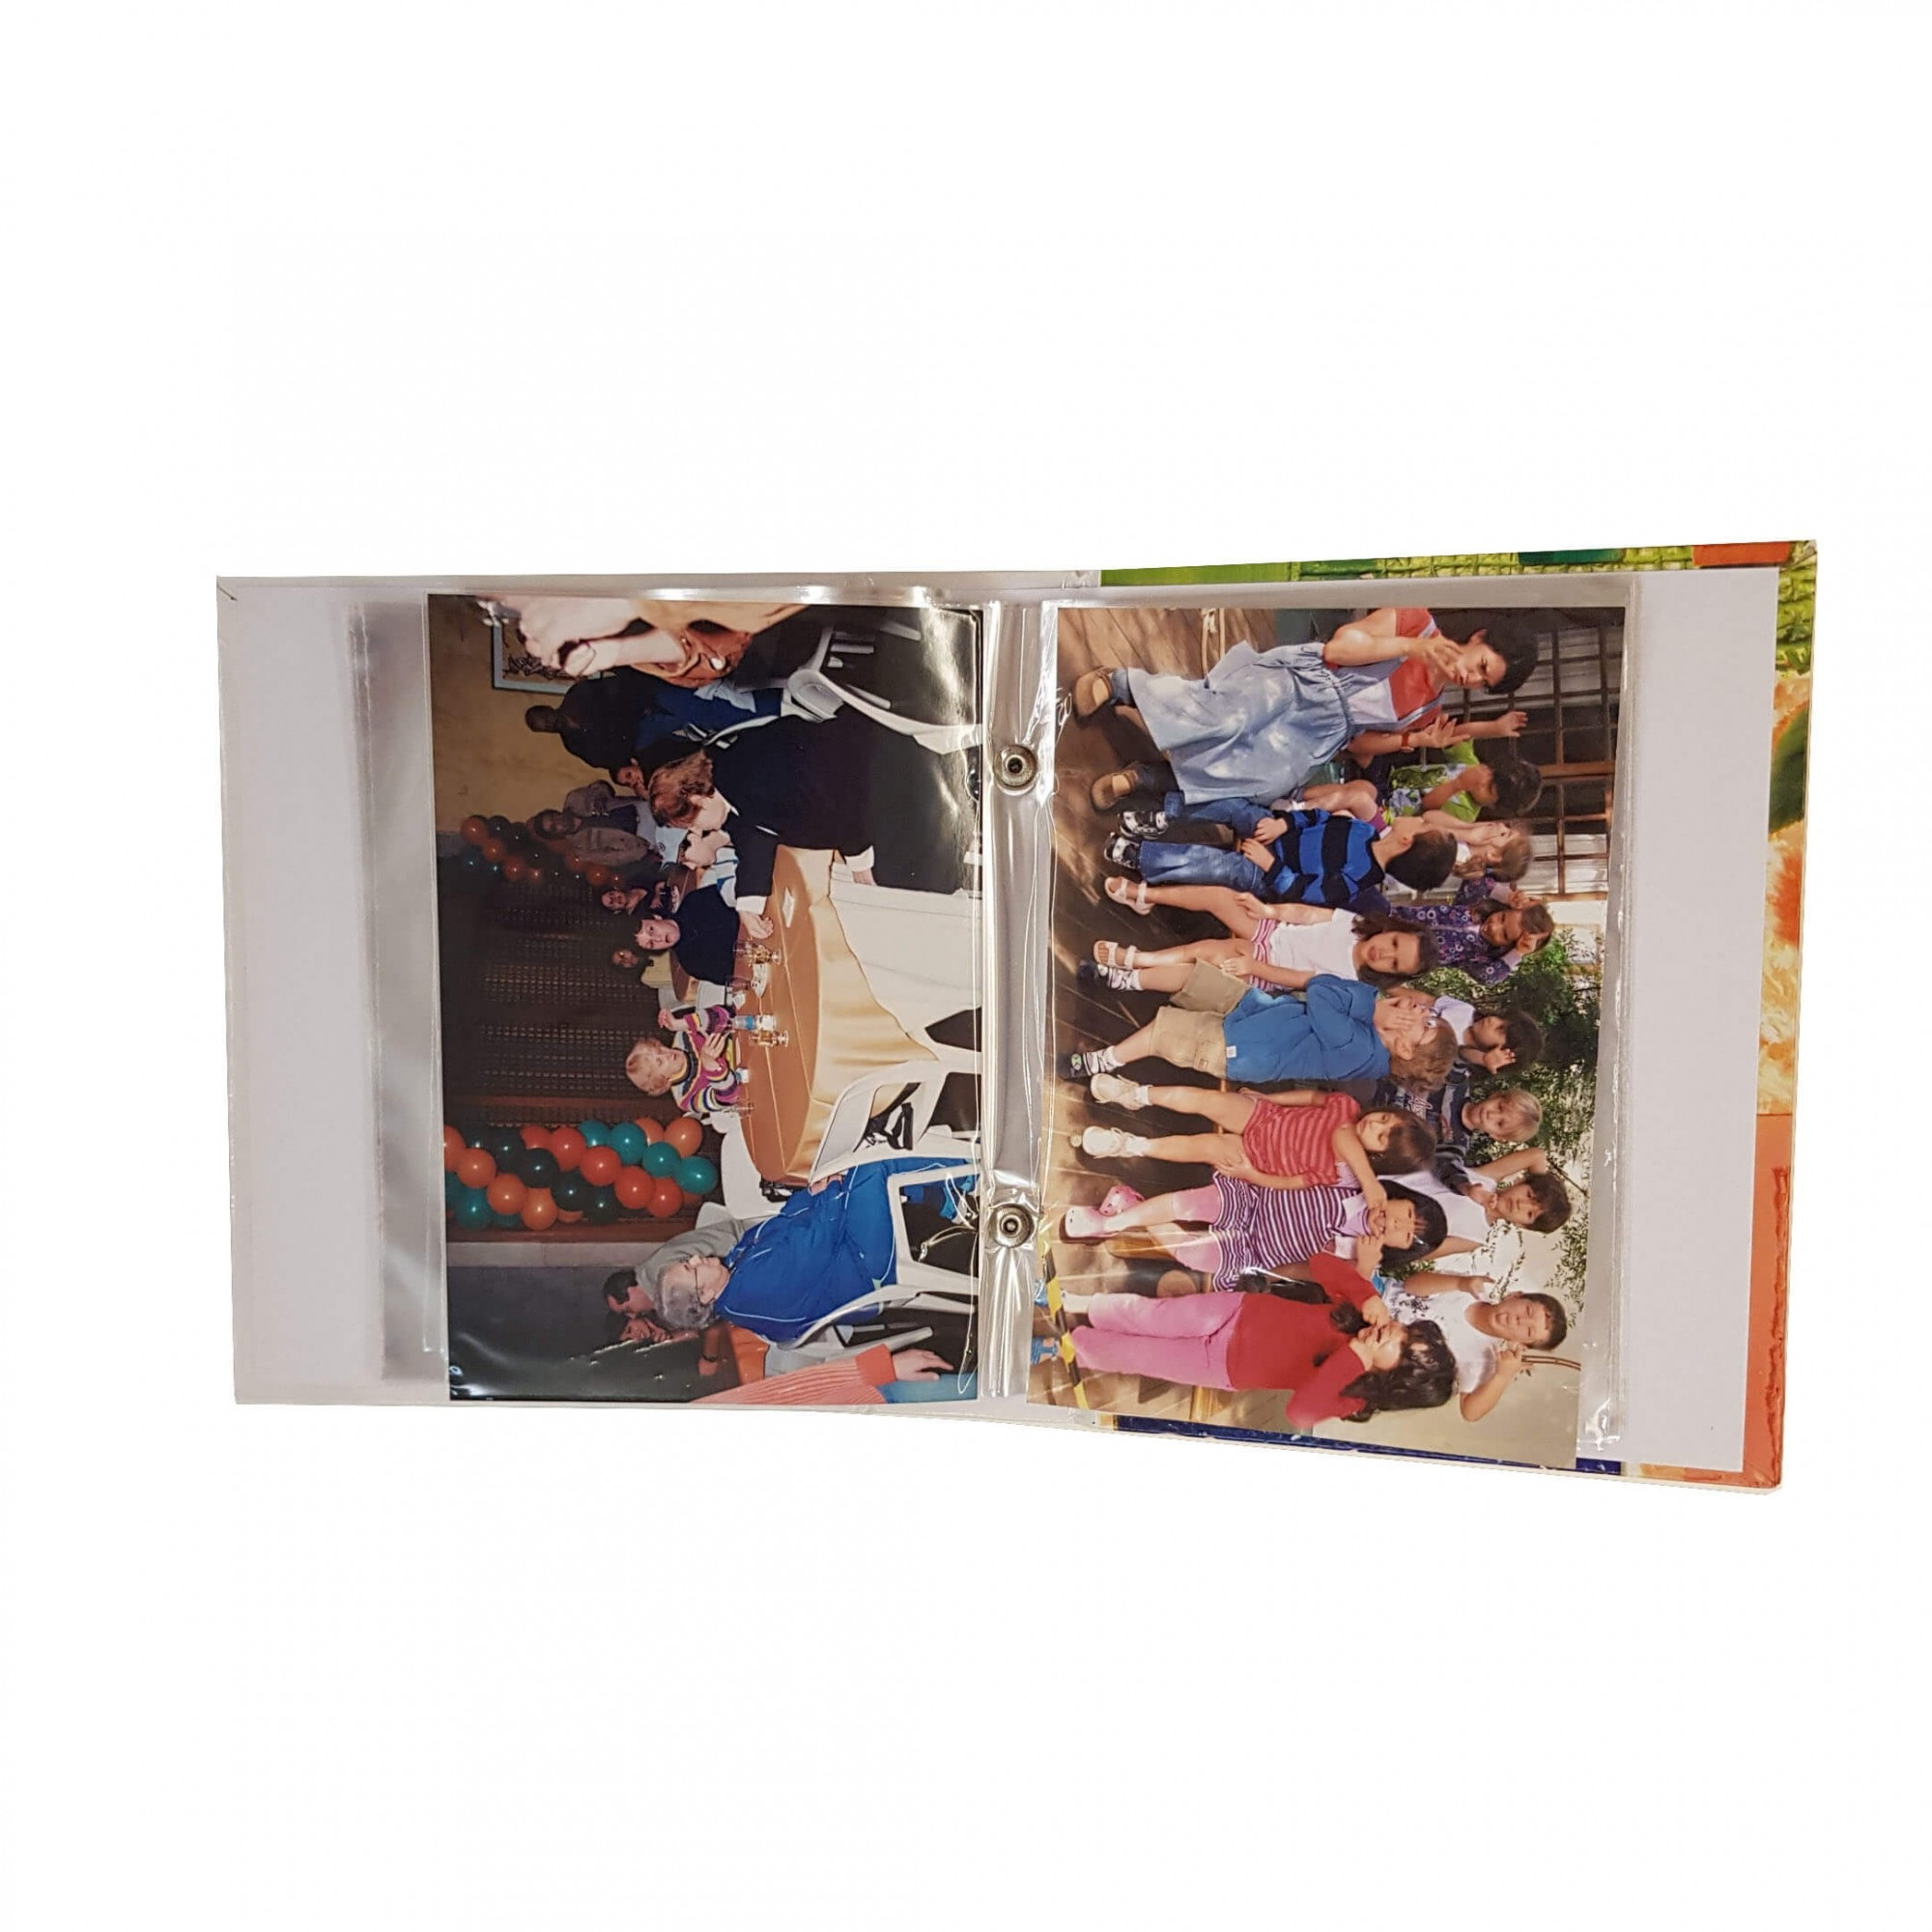 1 Álbum de fotos Fotografias  10 X15 120 Fotos Xadrez